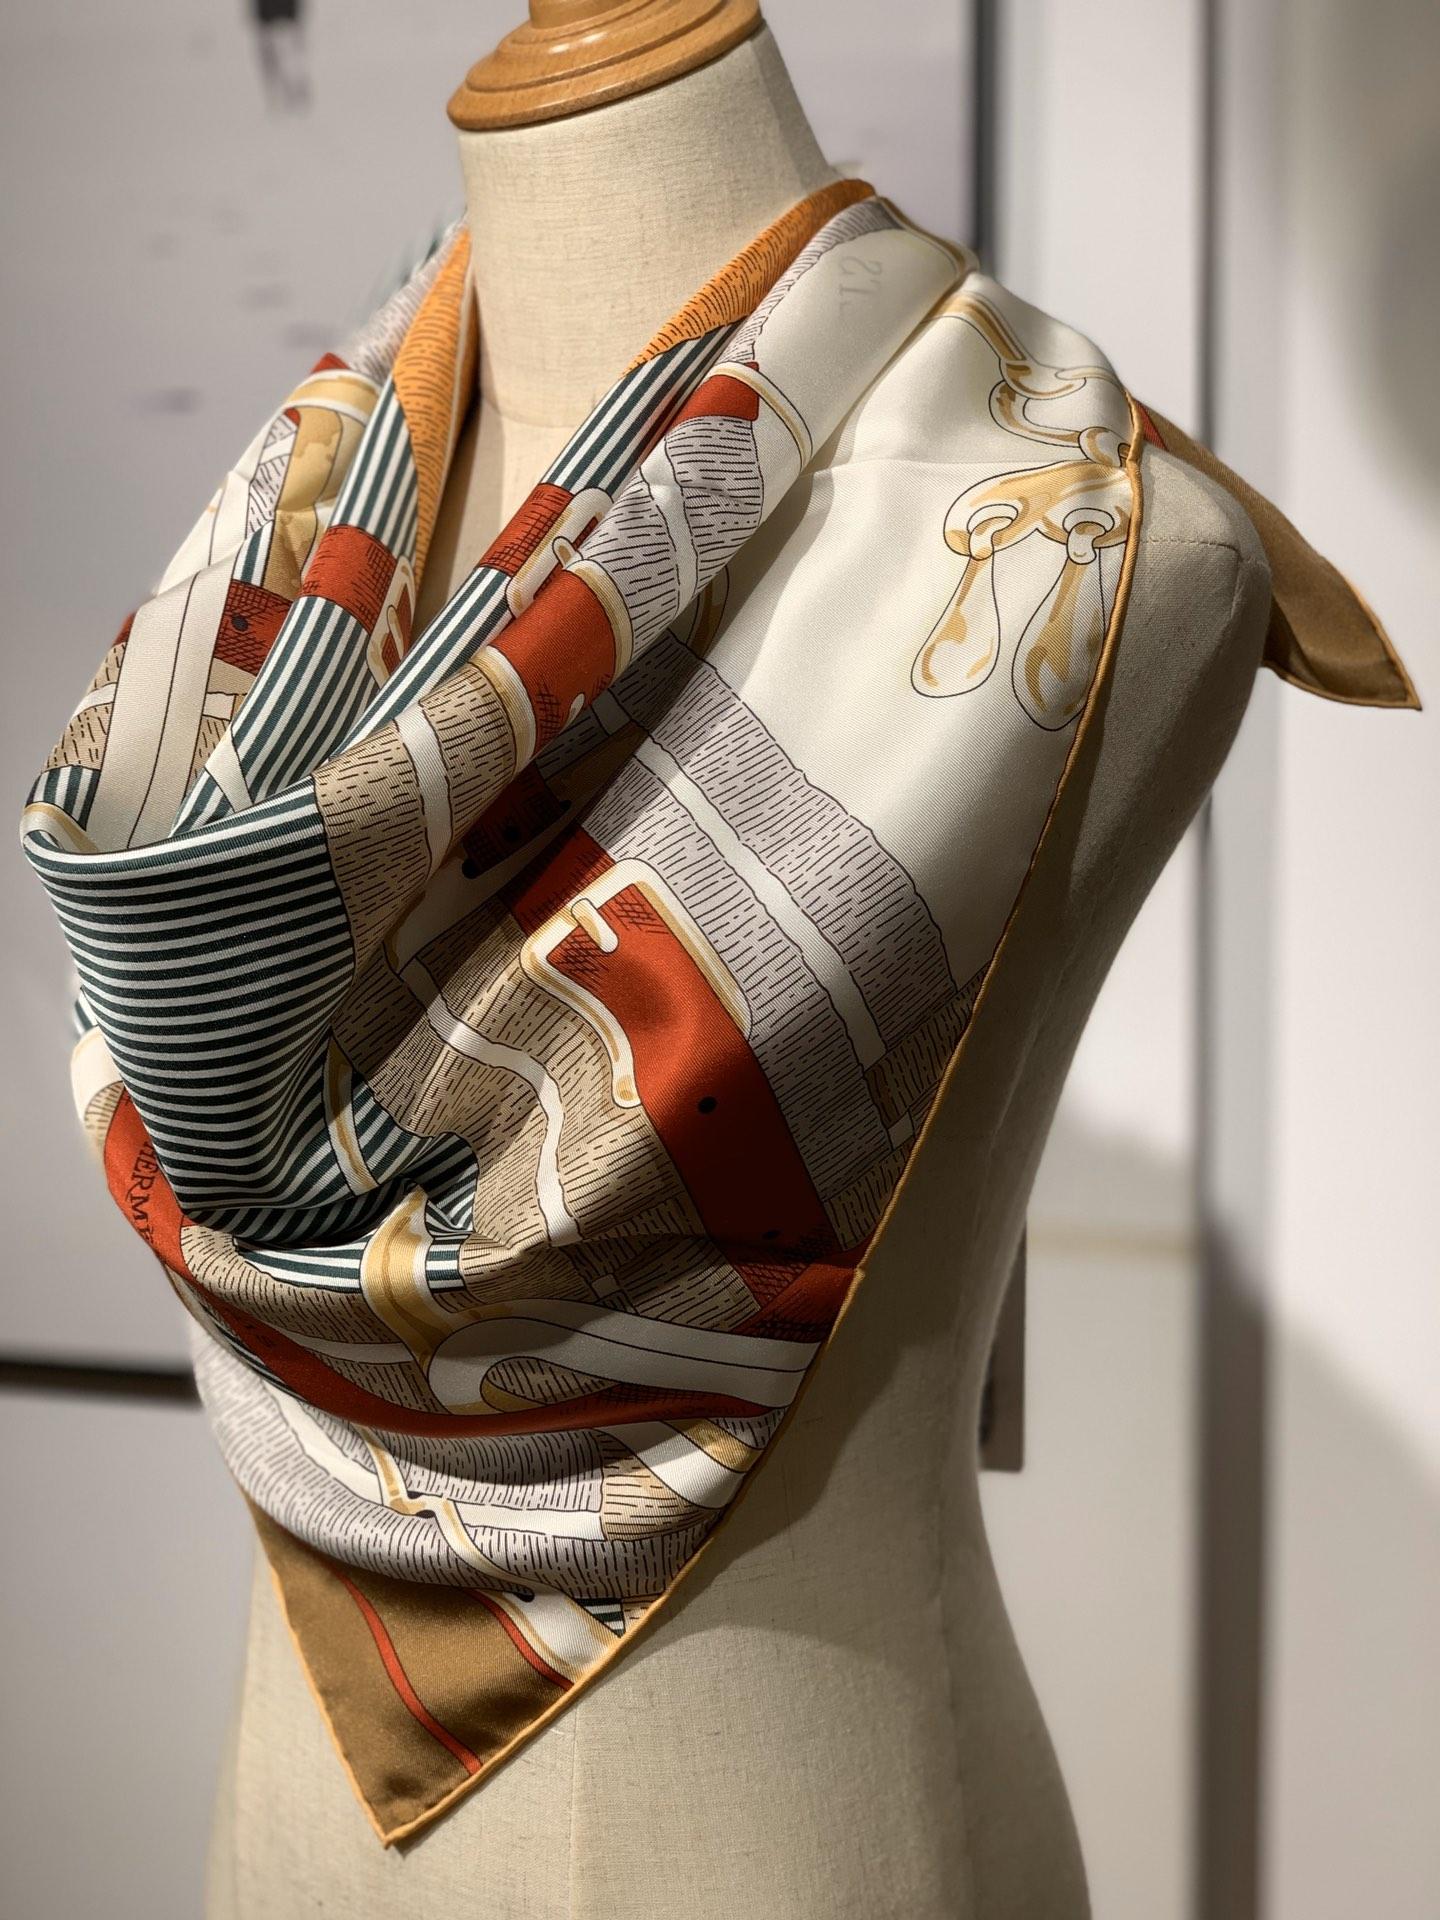 H  新款方巾  《马嚼锁环》 咖啡色 90.90cm  100%斜纹真丝  全套包装